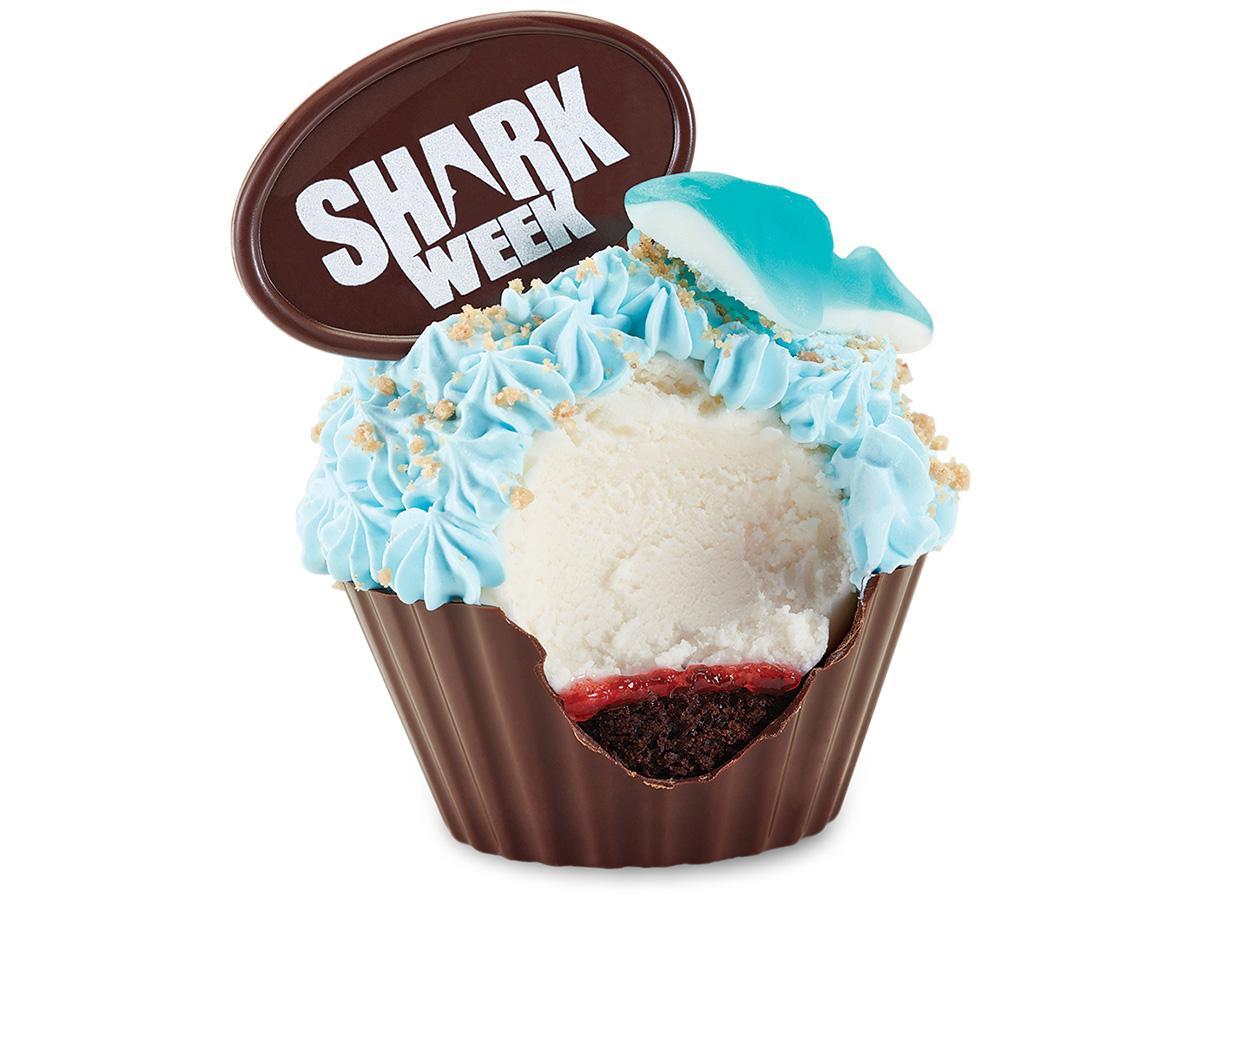 Cupcakes Deep Sea Delight at Cold Stone Creamery